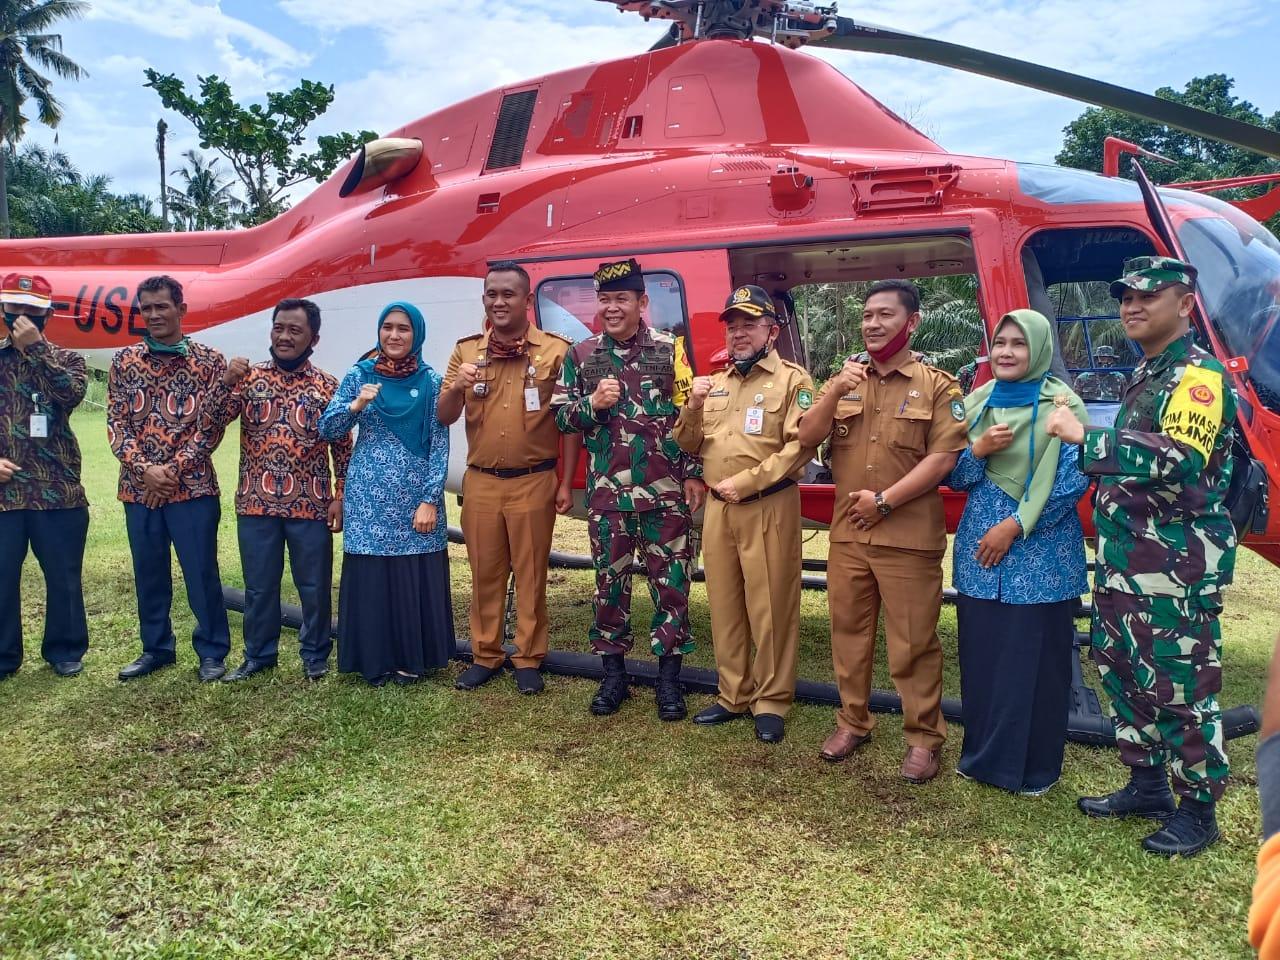 Sambut Kedatangan Jendral Bintang Dua di Desanya, Ini Ungkap Kades Temiang